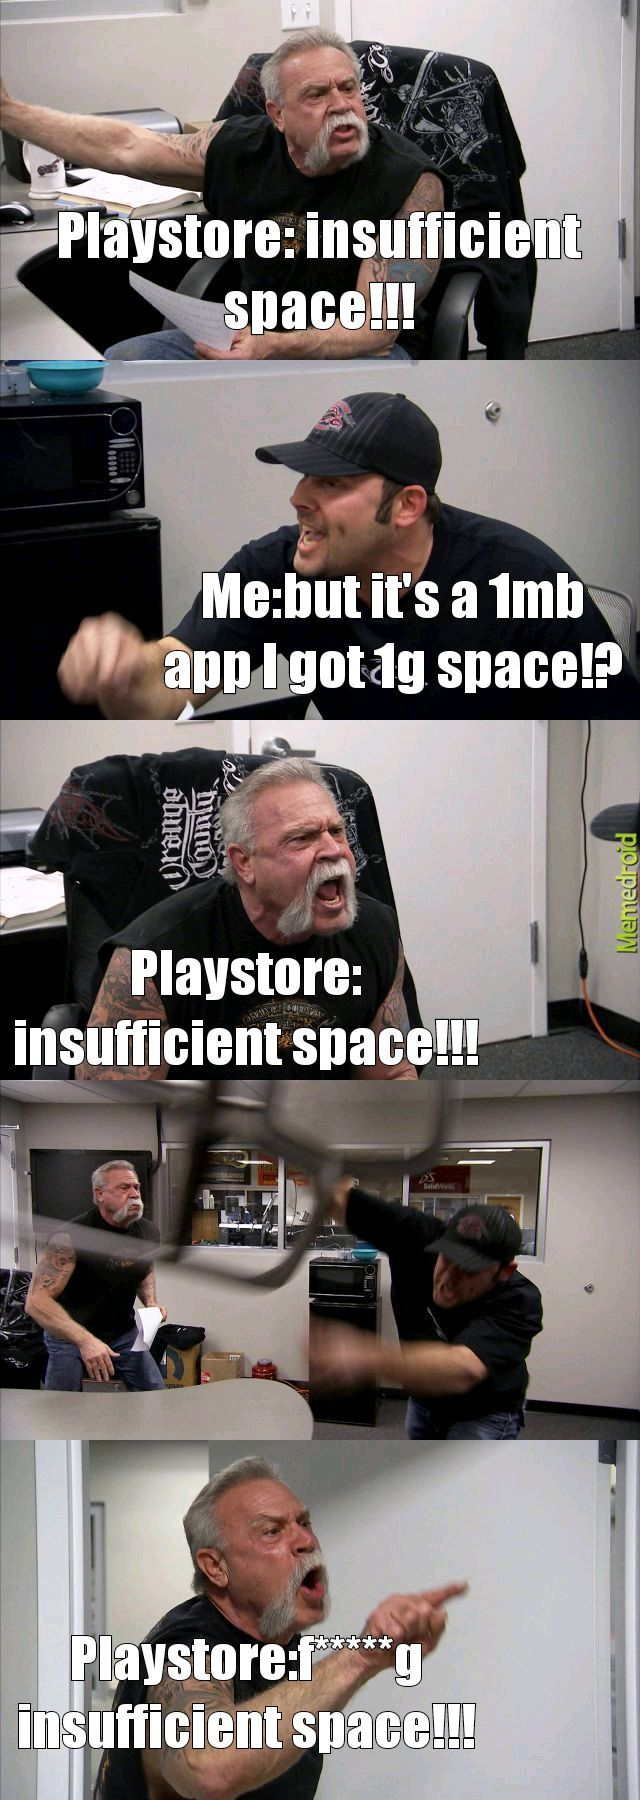 Insufficient space - meme